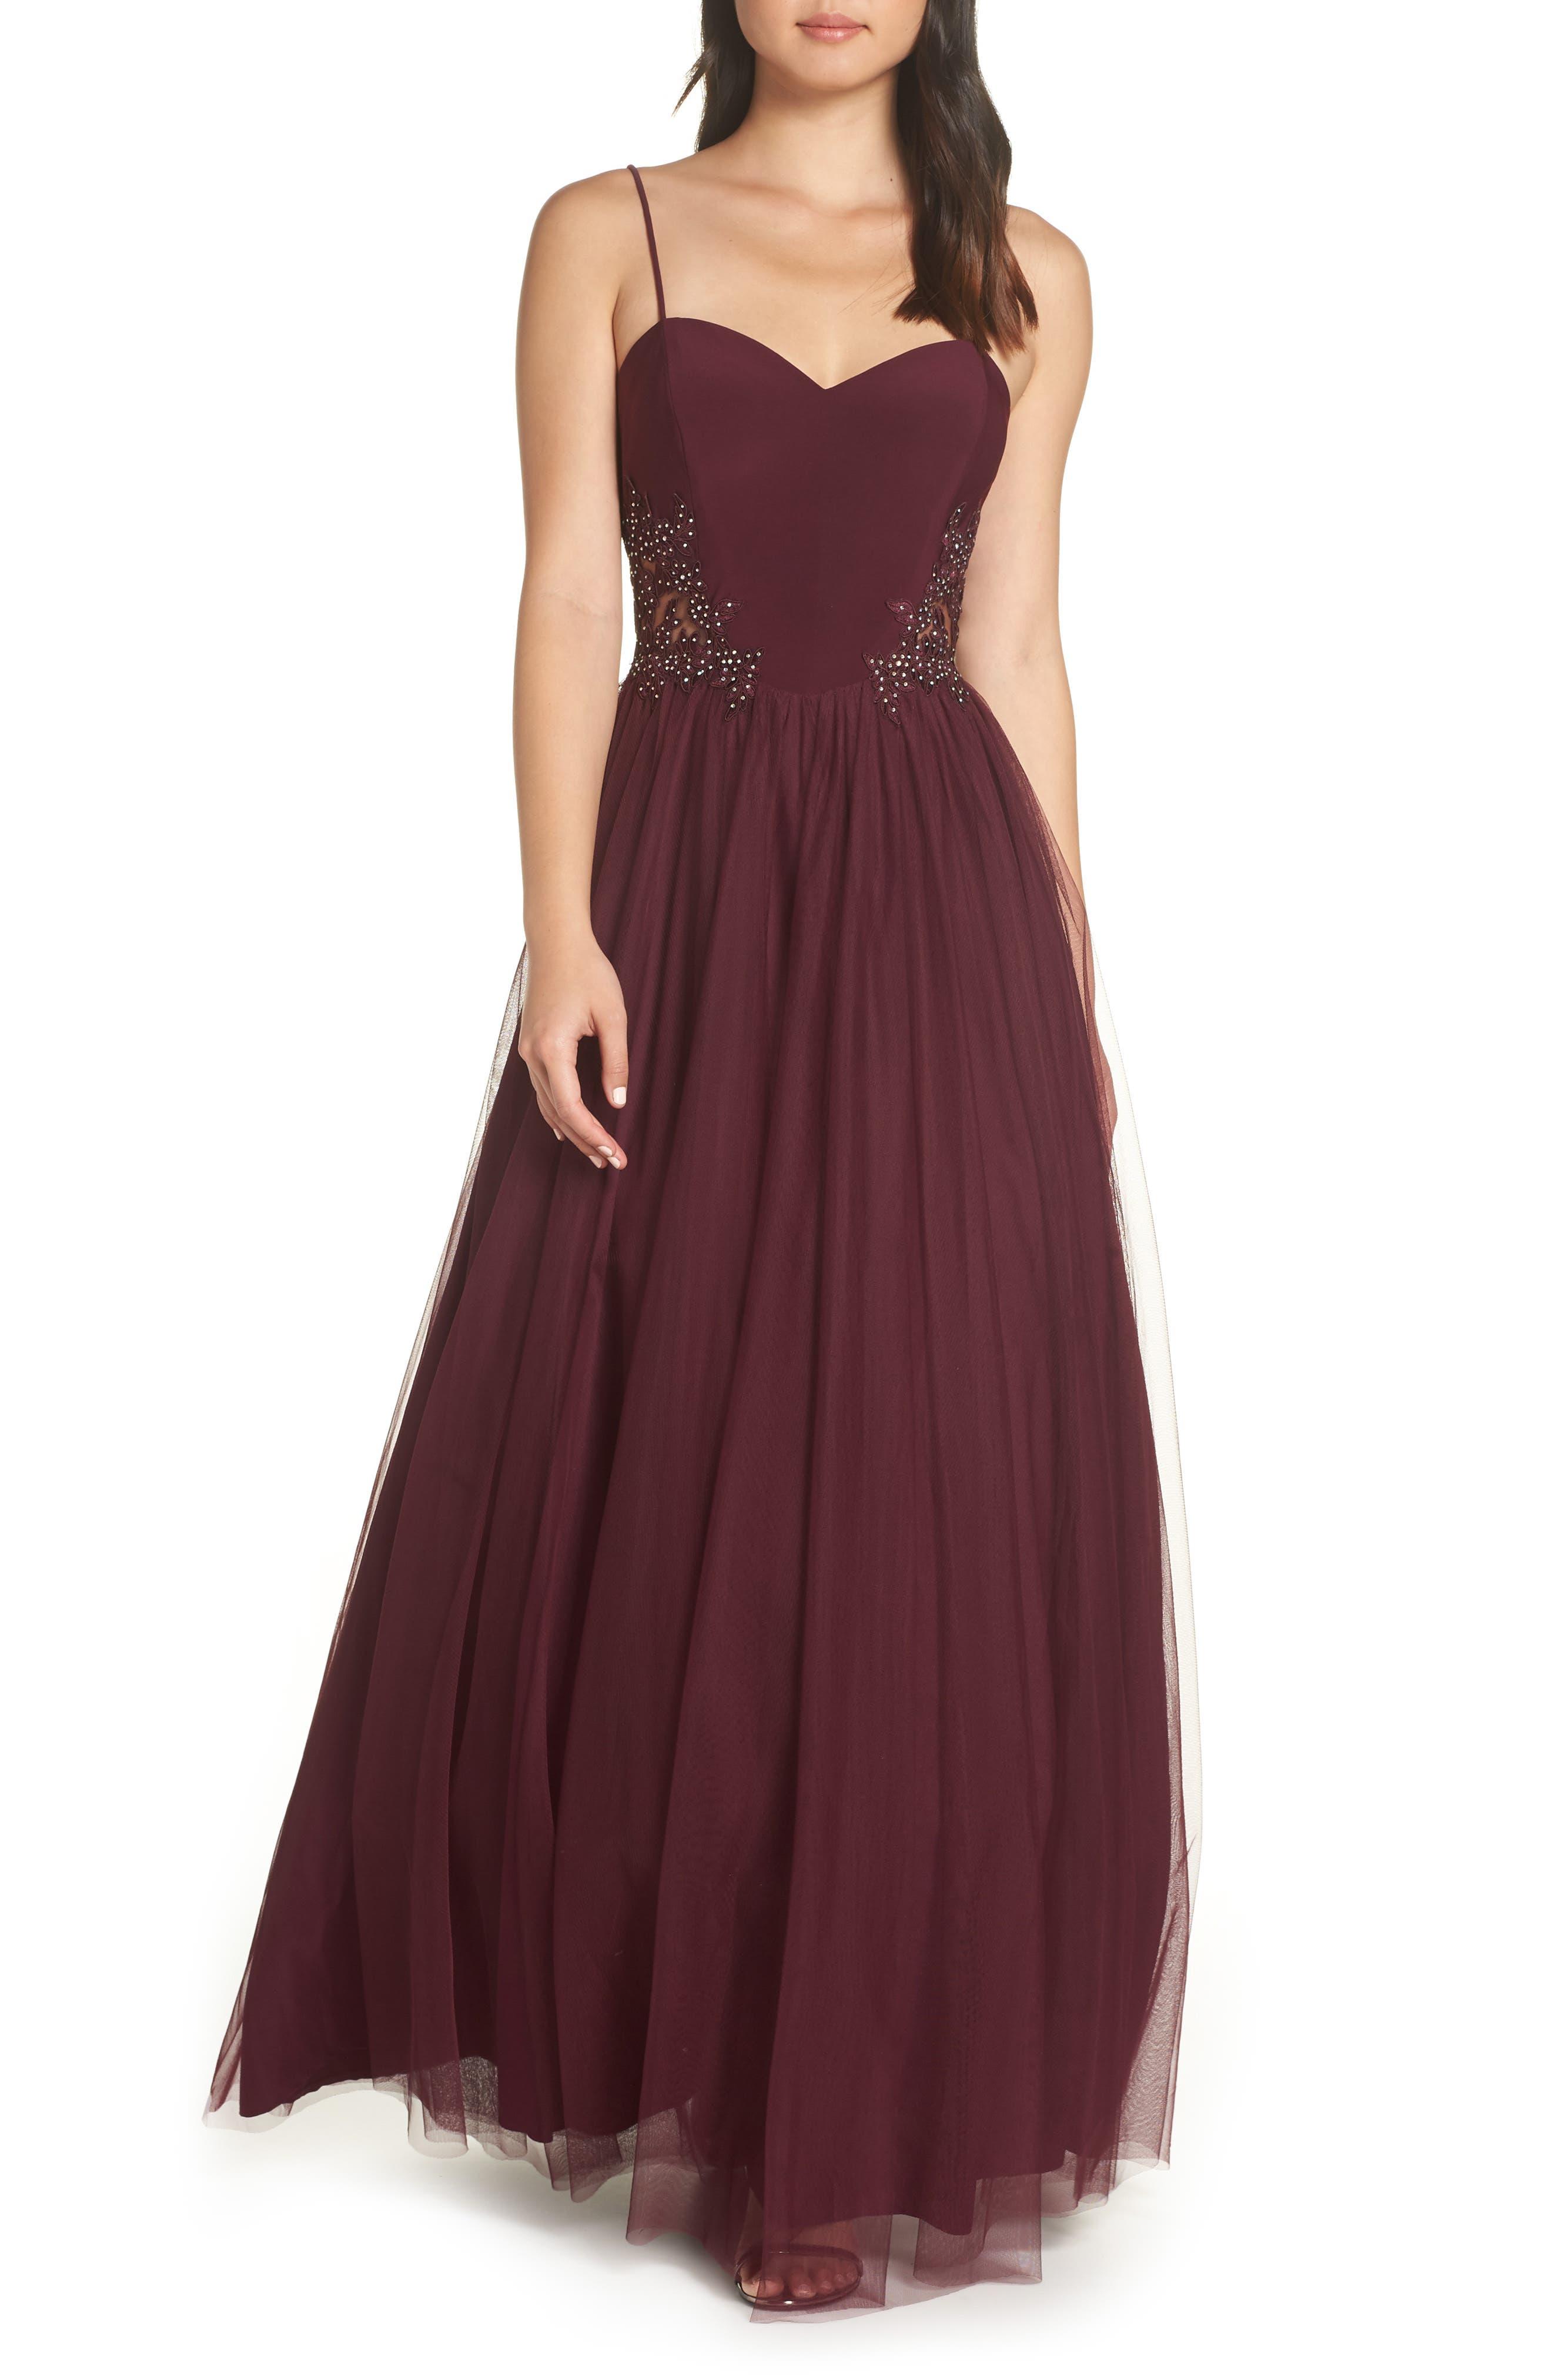 Blondie Nites Sweetheart Chiffon Gown, Burgundy